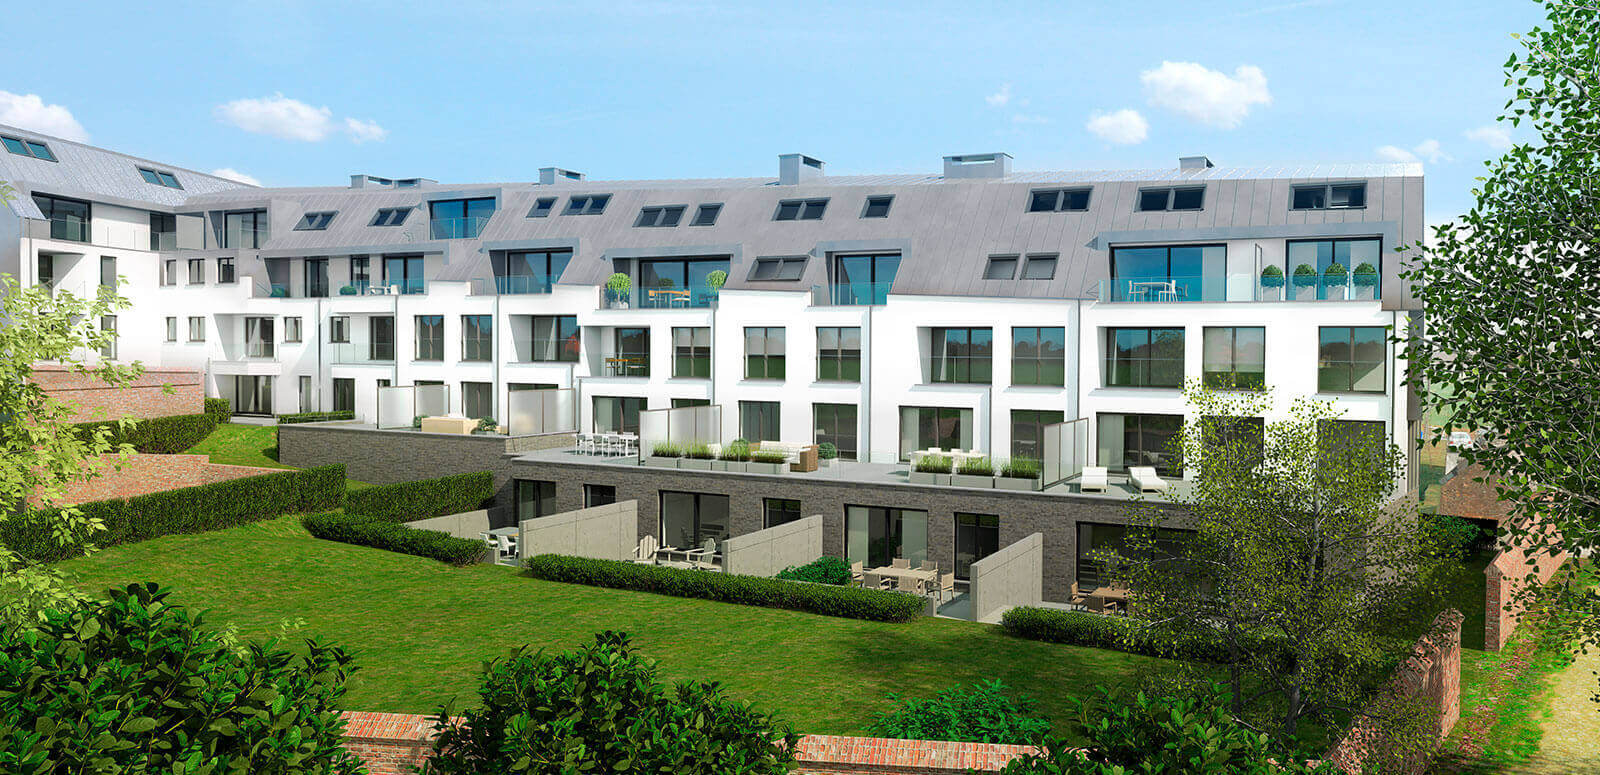 Robert Lariellestraat - Brusselsesteenweg,  Halle